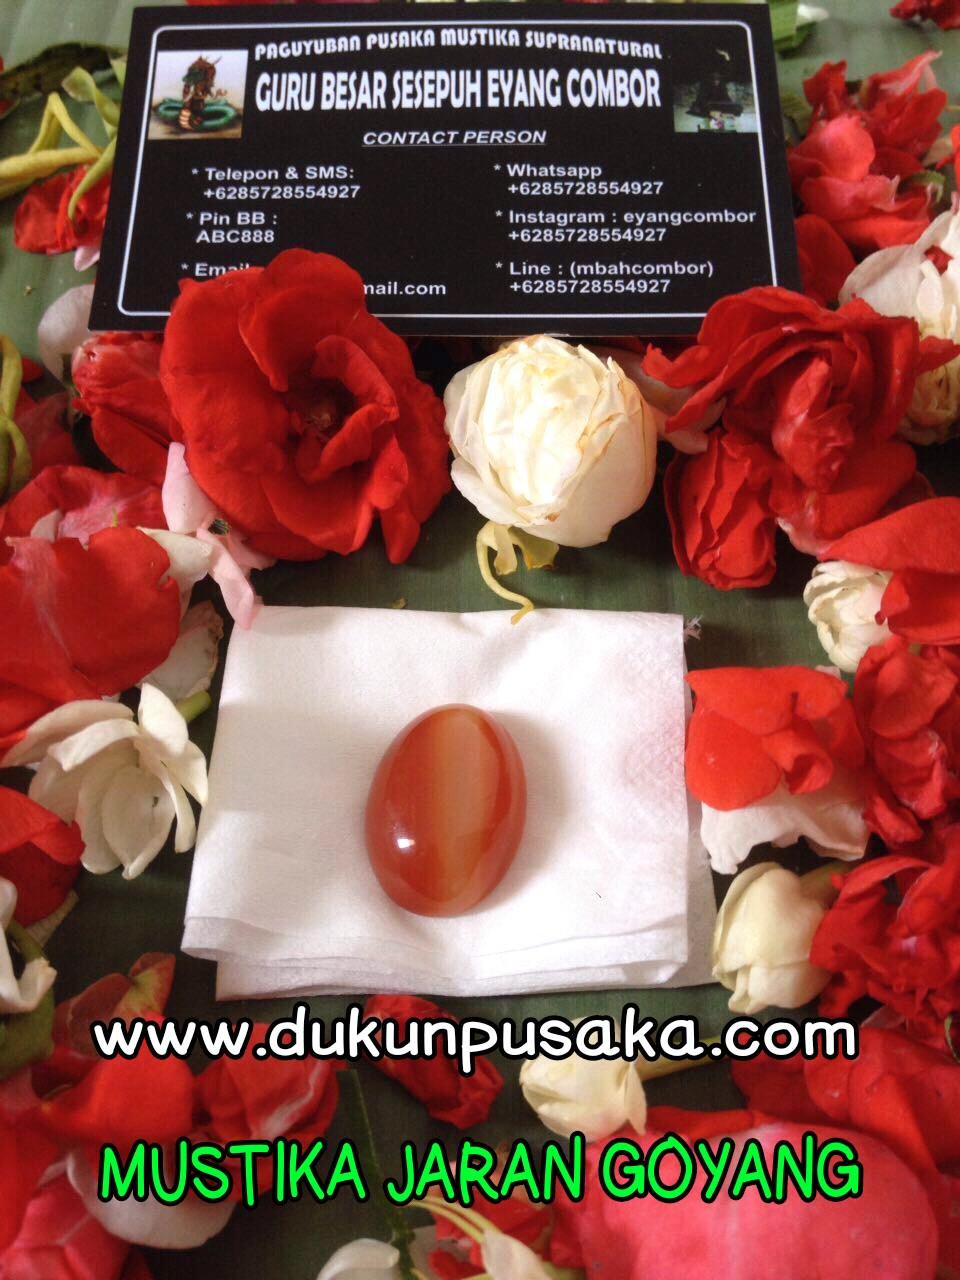 Mustika jaran goyang dukun sakti dimaharkan mustika jaran goyang stopboris Image collections